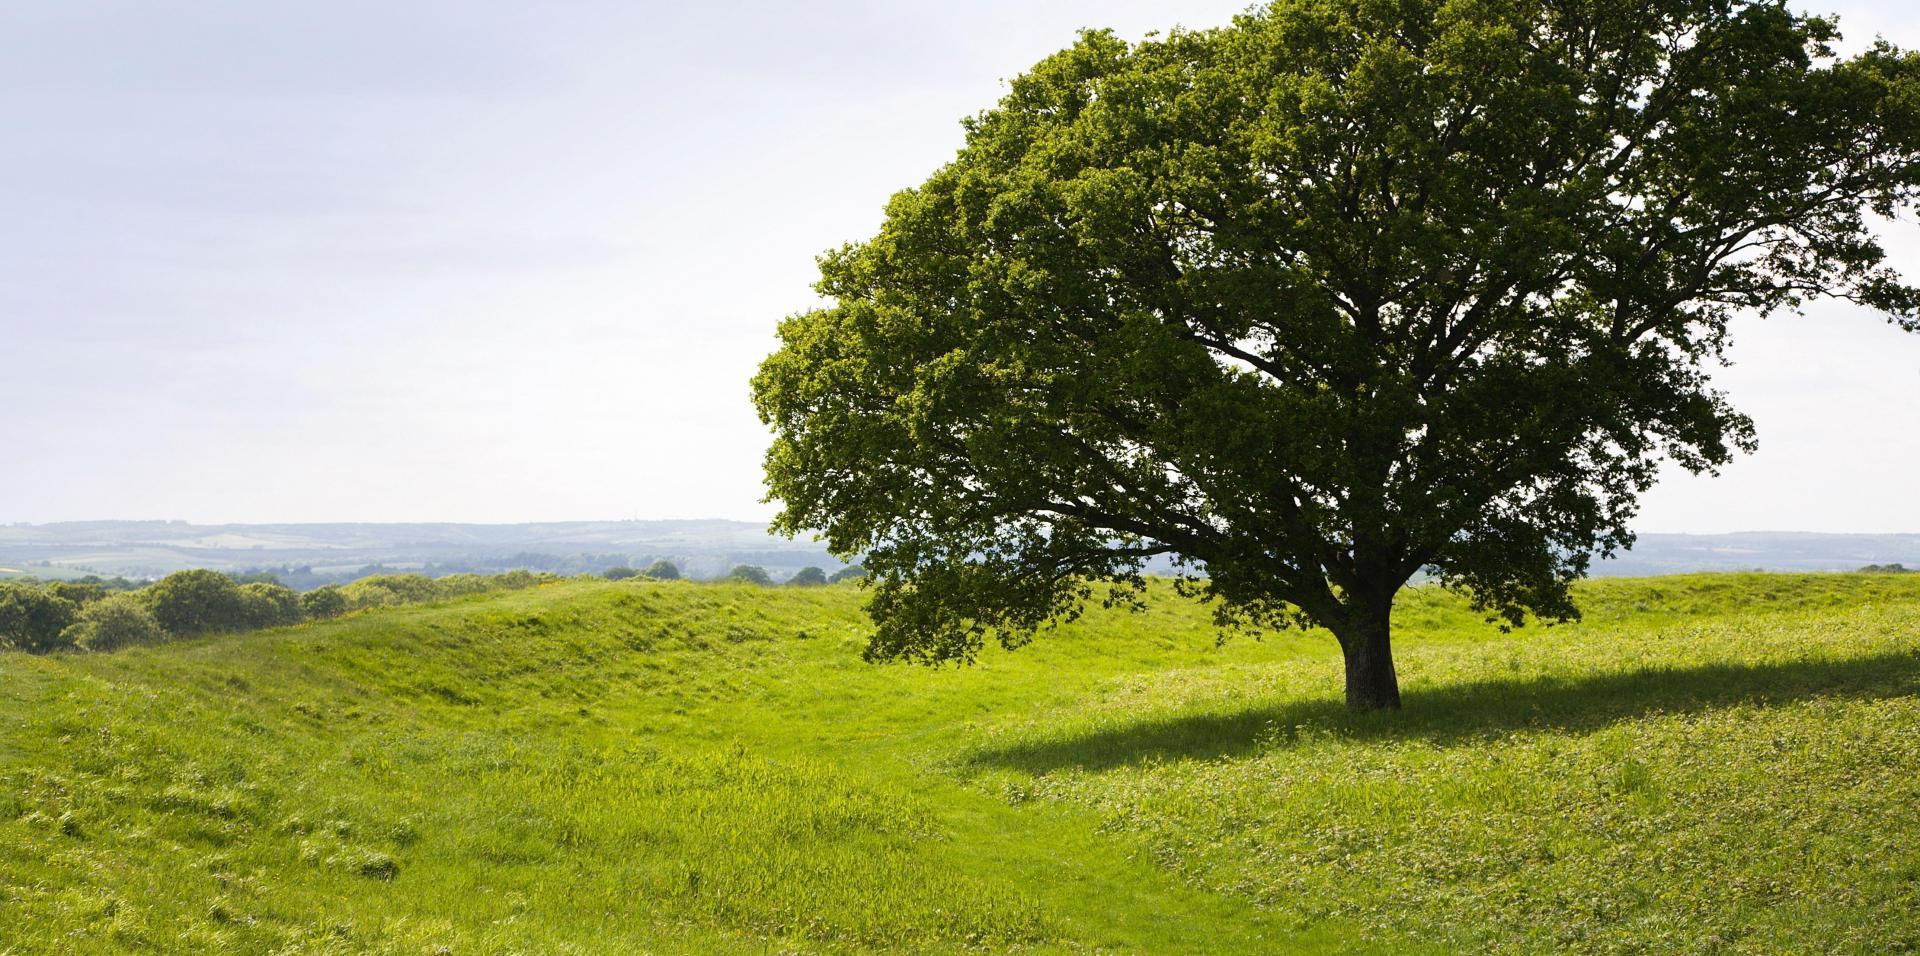 baner z drzewem